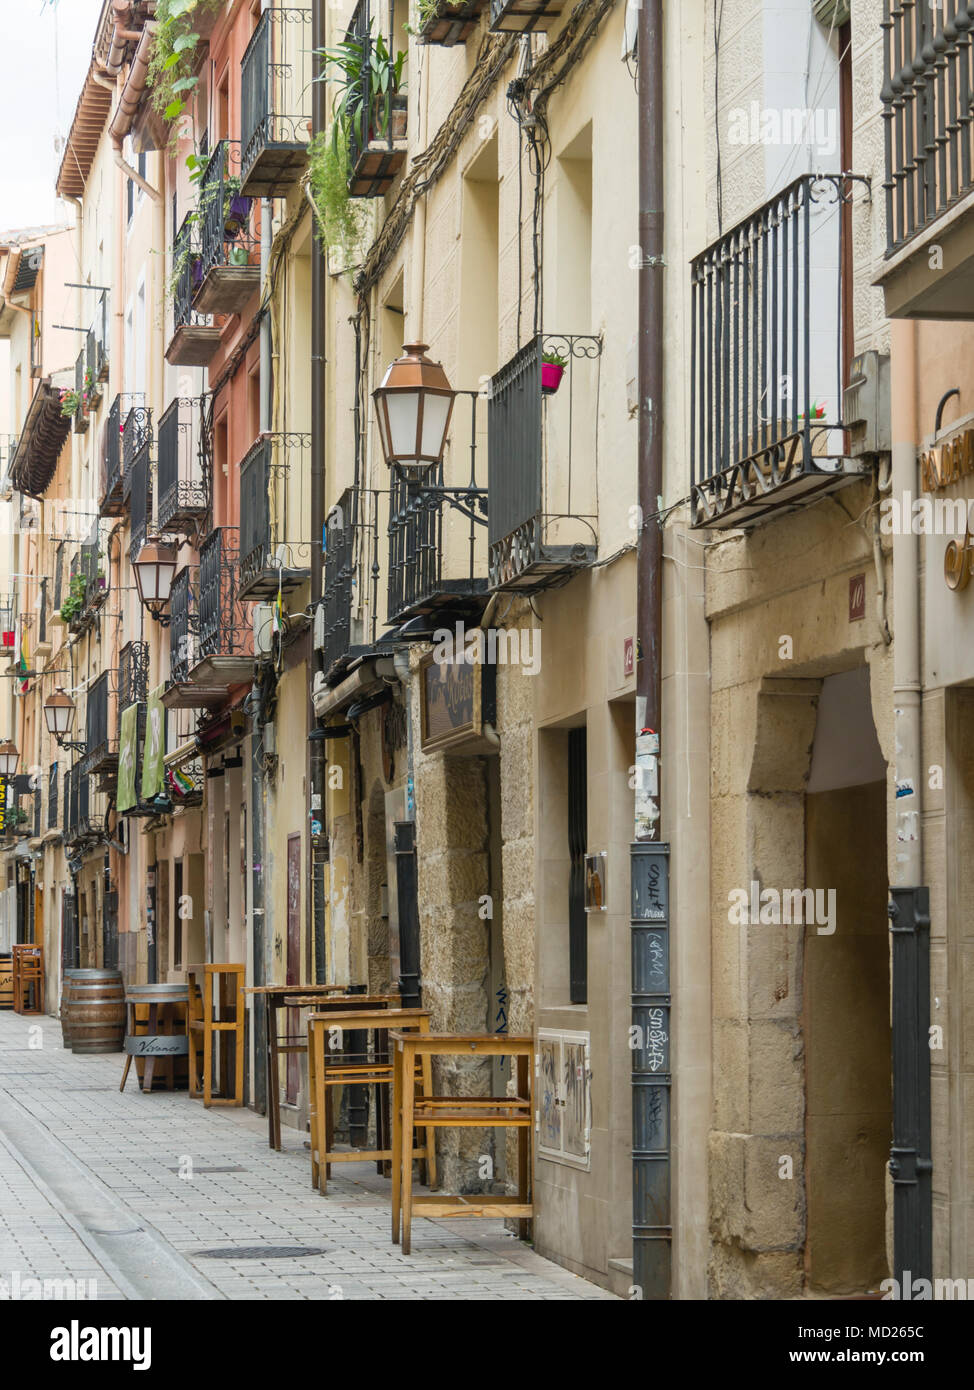 Tapas bars in a side street in Logroño, Spain Stock Photo